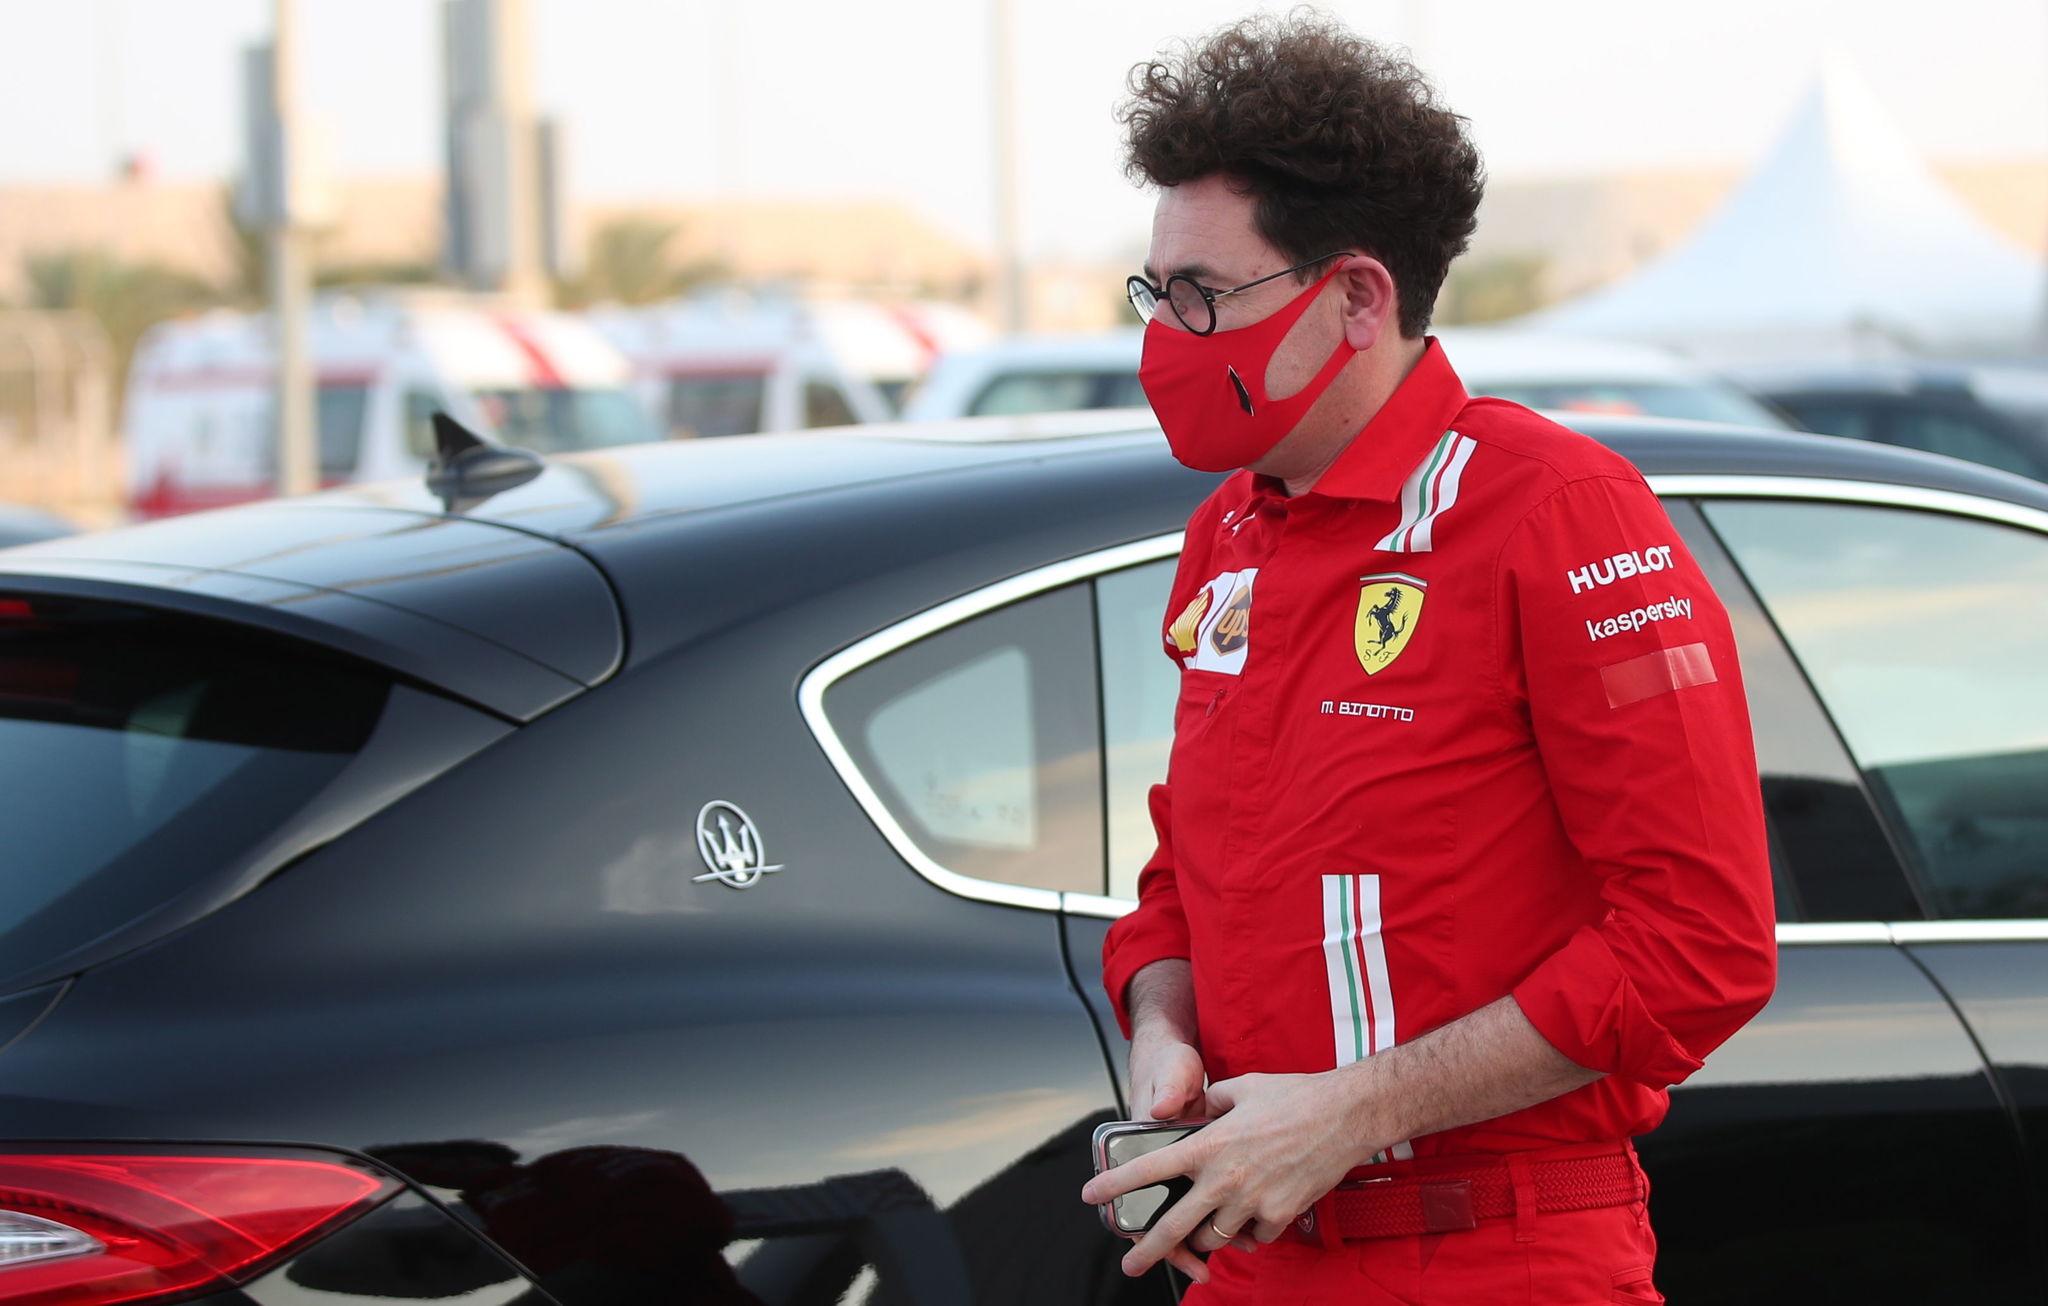 Manama (Bahrain), 03/12/2020.- Scuderia Ferrari team principal Mattia lt;HIT gt;Binotto lt;/HIT gt; arrives at the paddock at Bahrain International Circuit near Manama, Bahrain, 03 December 2020. The Formula One Sakhir Grand Prix will take place on 06 December 2020. (Fórmula Uno, Bahrein) EFE/EPA/TOLGA BOZOGLU